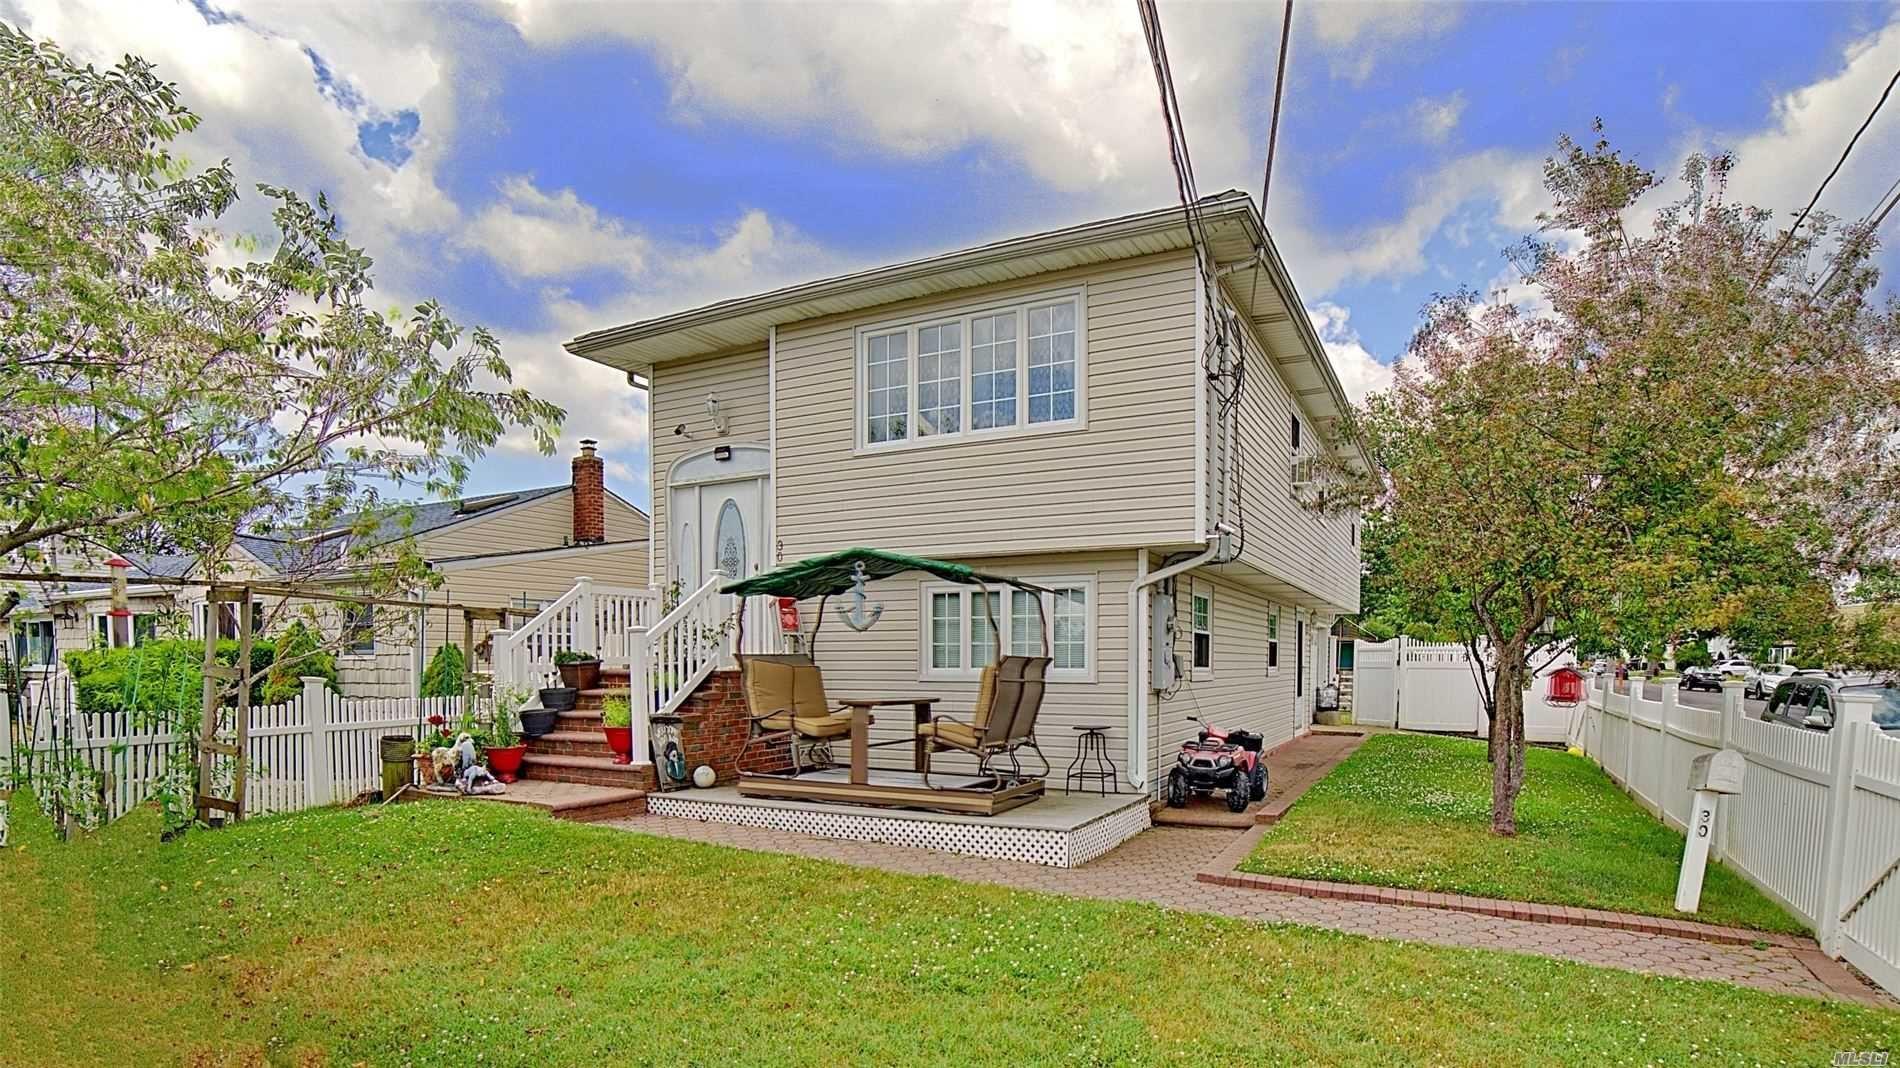 30 Inlet, Lindenhurst, NY 11757 - MLS#: 3227429